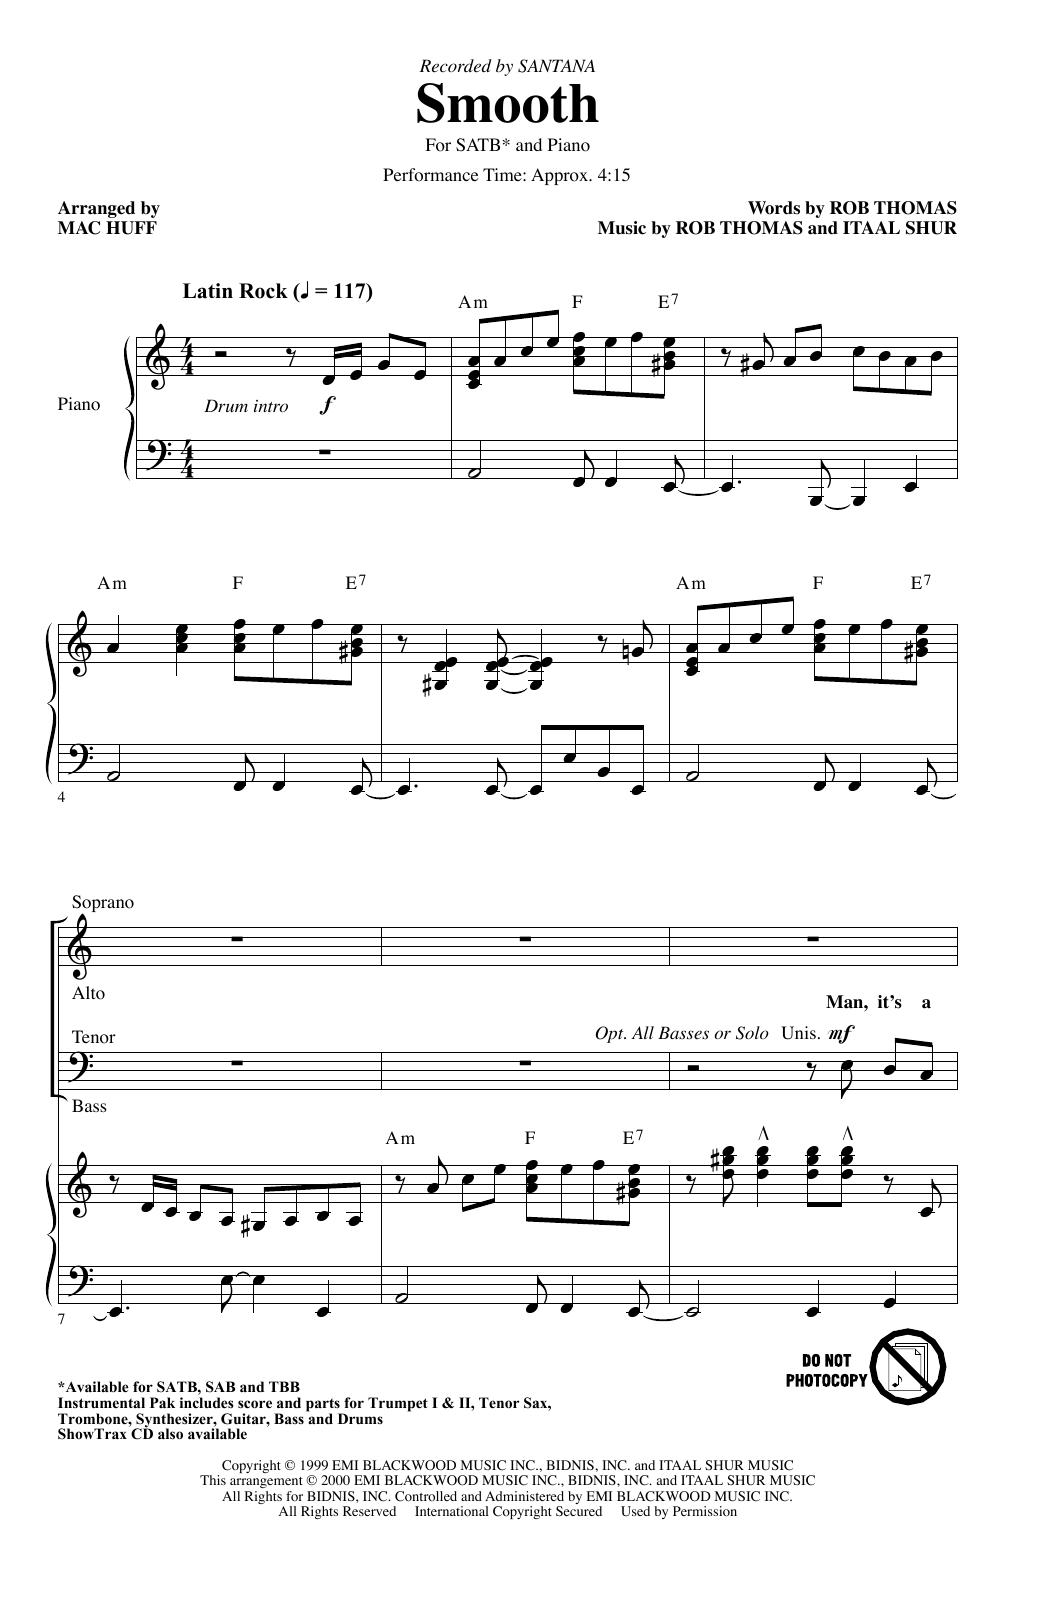 Smooth (arr. Mac Huff) (SATB Choir)